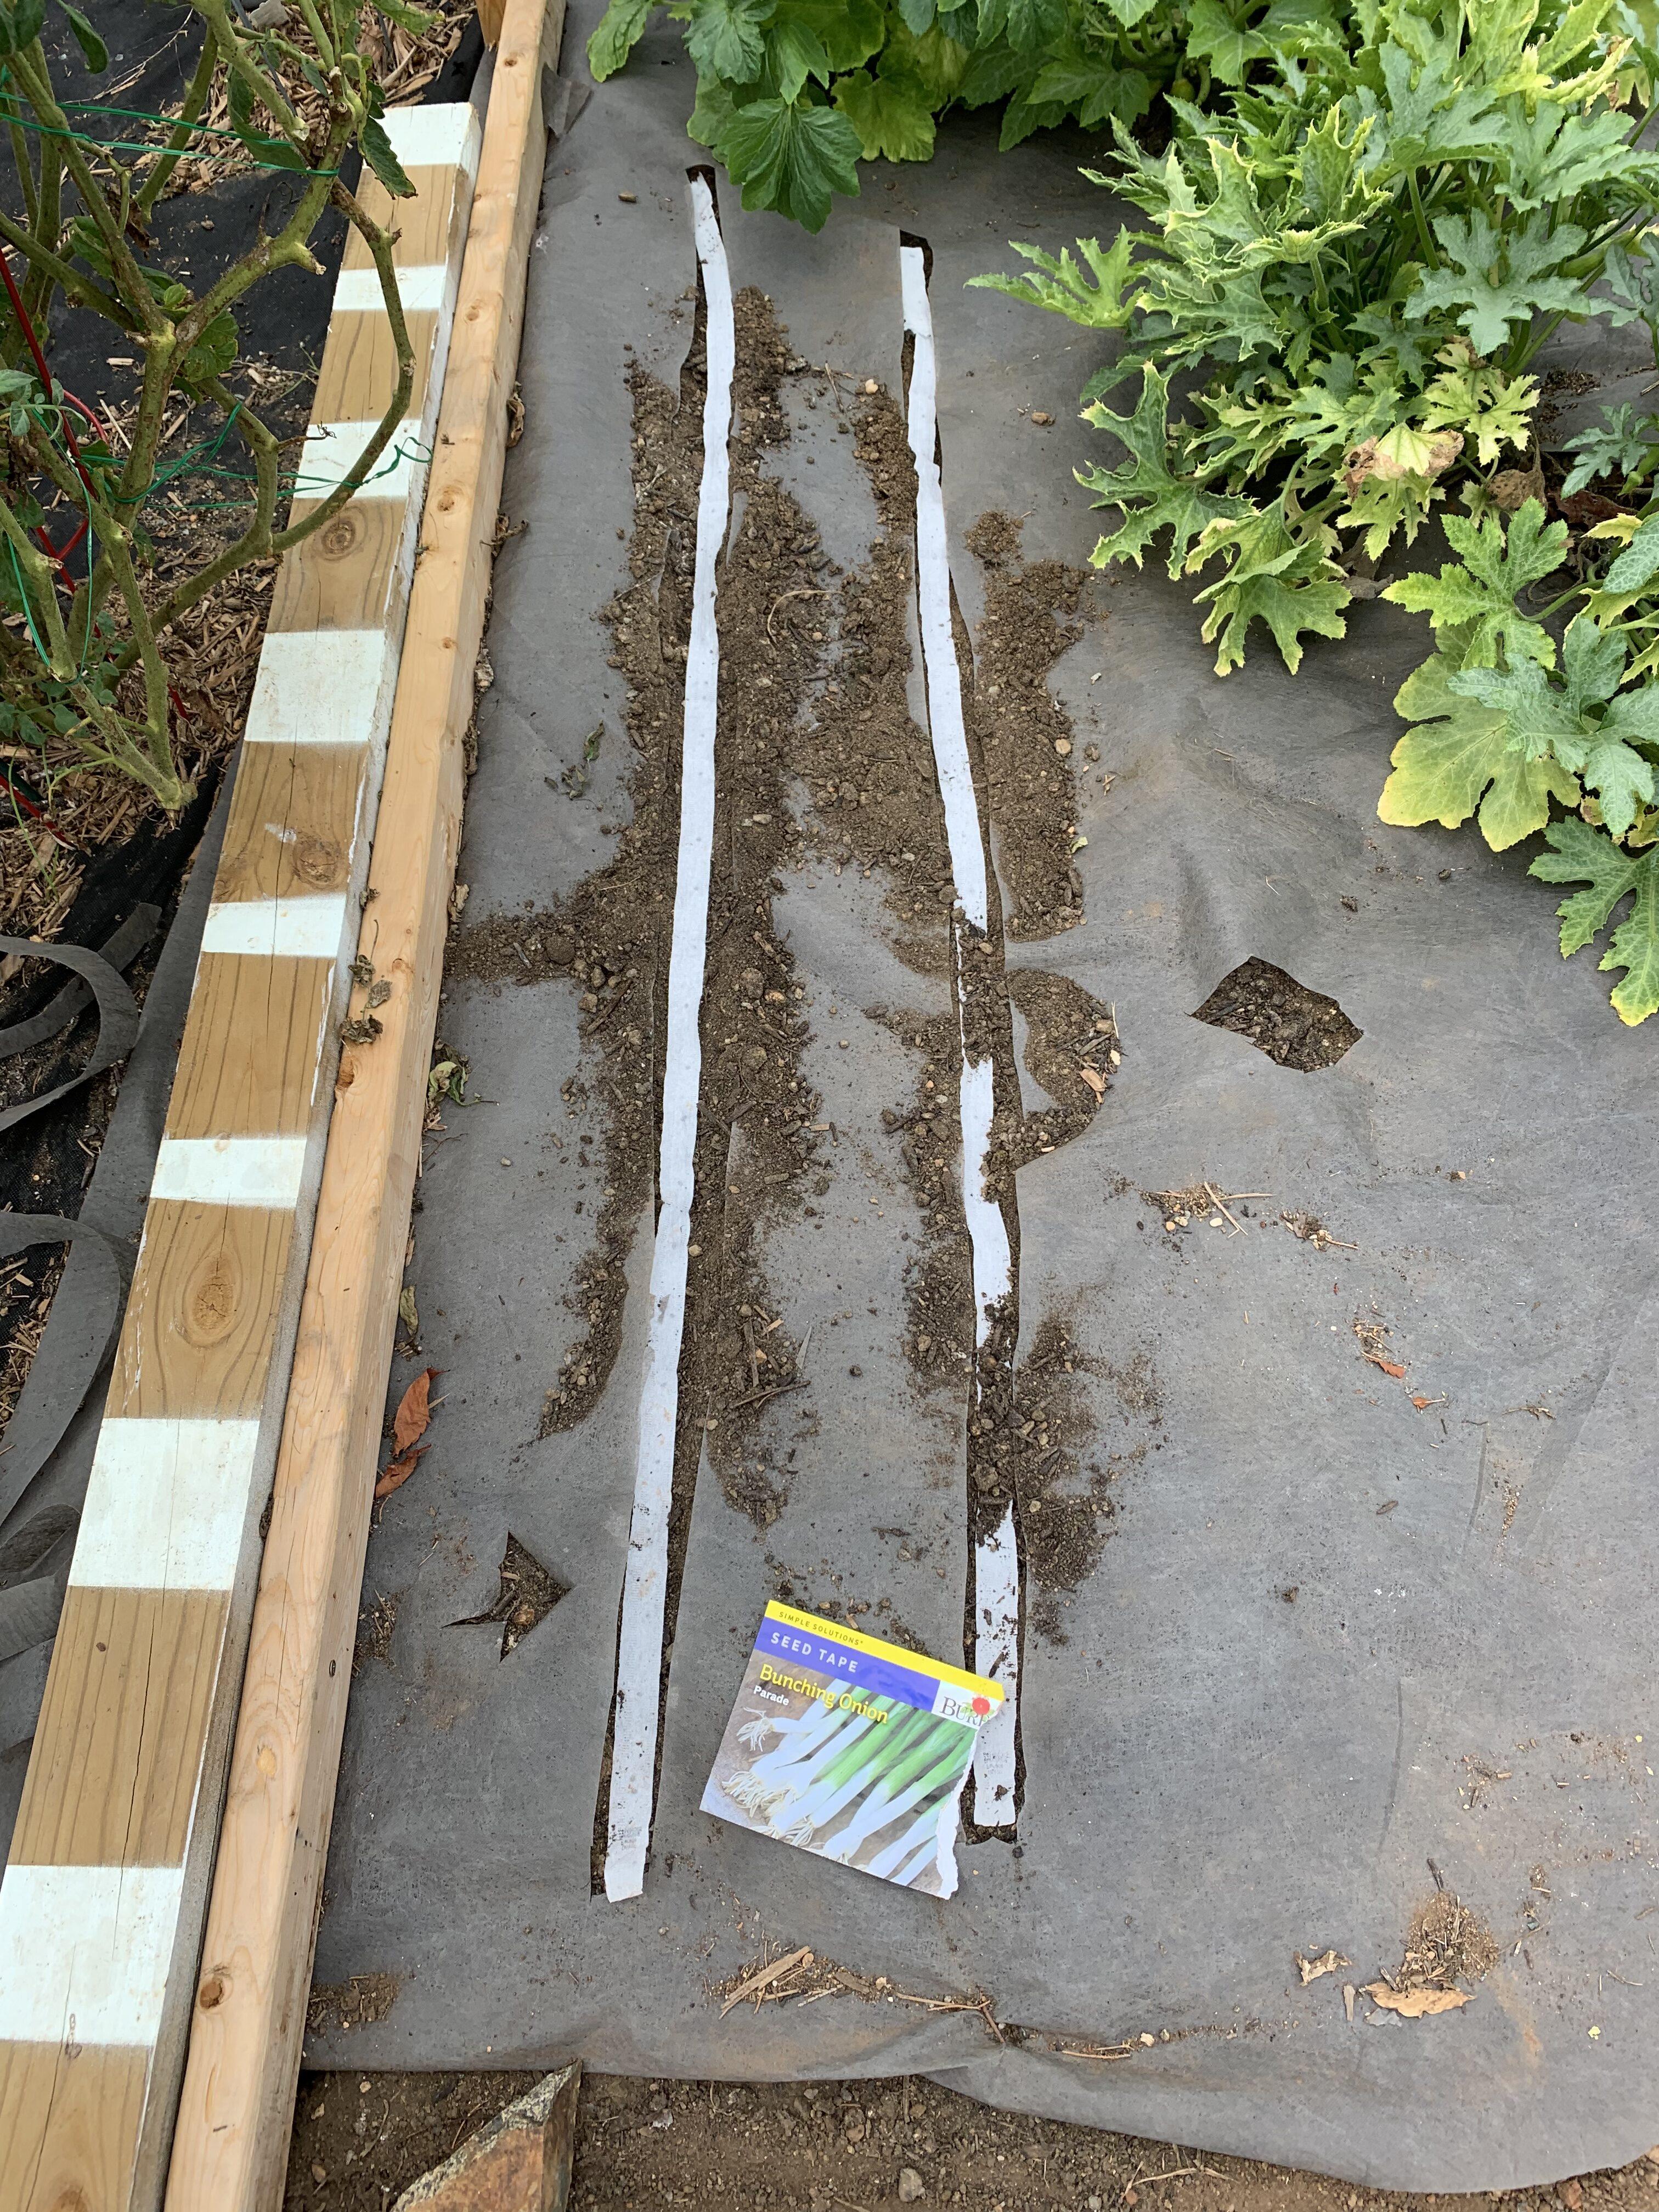 60FB4550 A2ED 40B0 B7CA A2369E1E69DC The carrots sprouted!